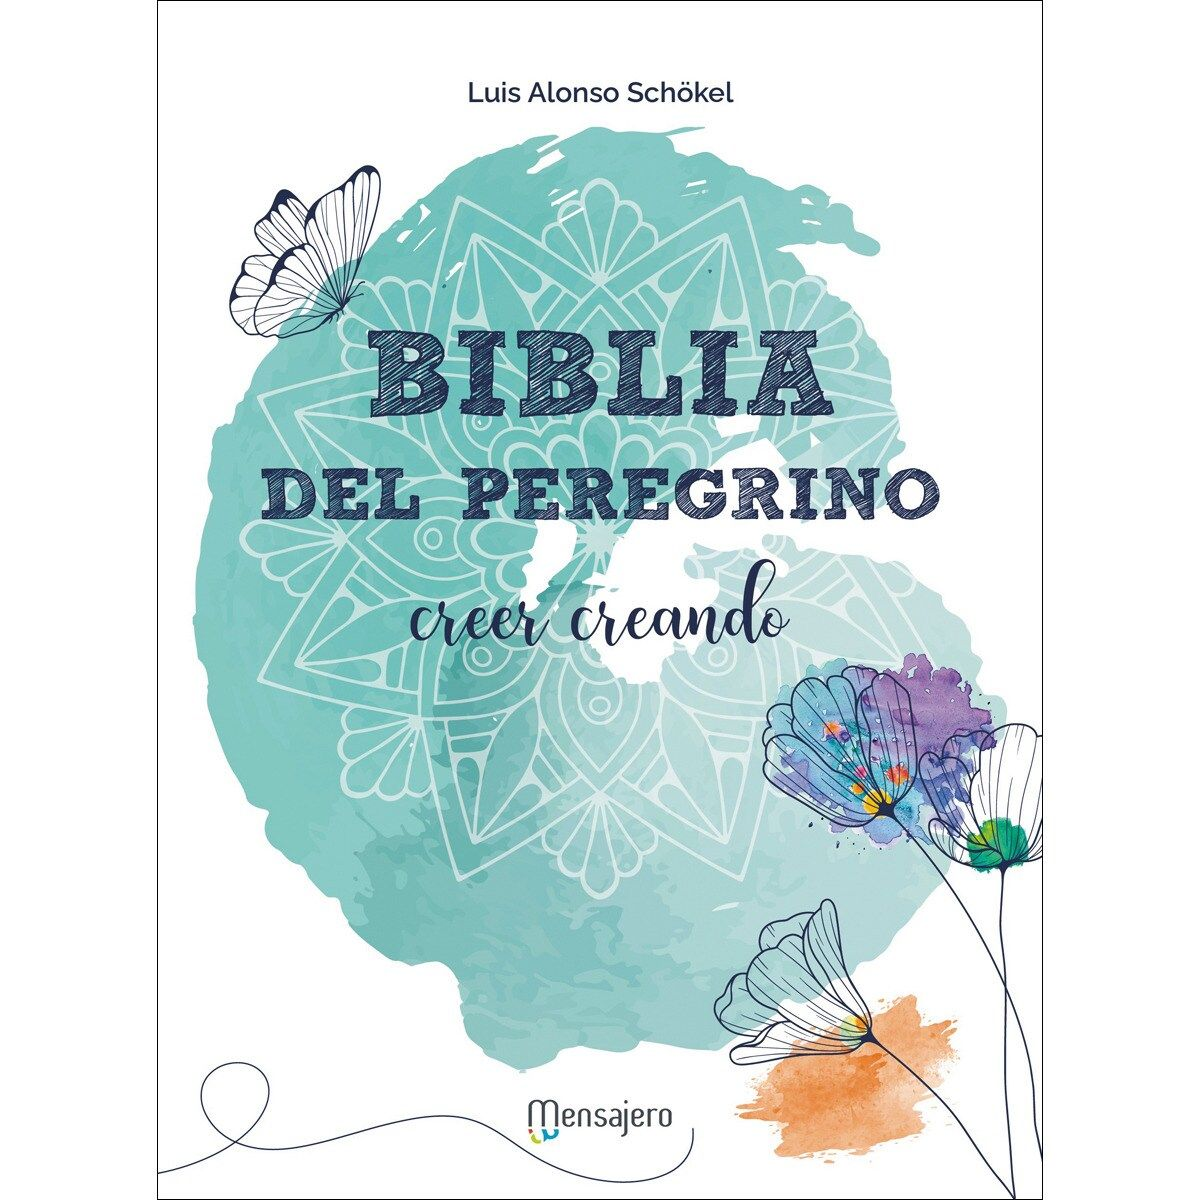 BIBLIA DEL PEREGRINO, LA -CREER CREANDO ILUSTRADA-